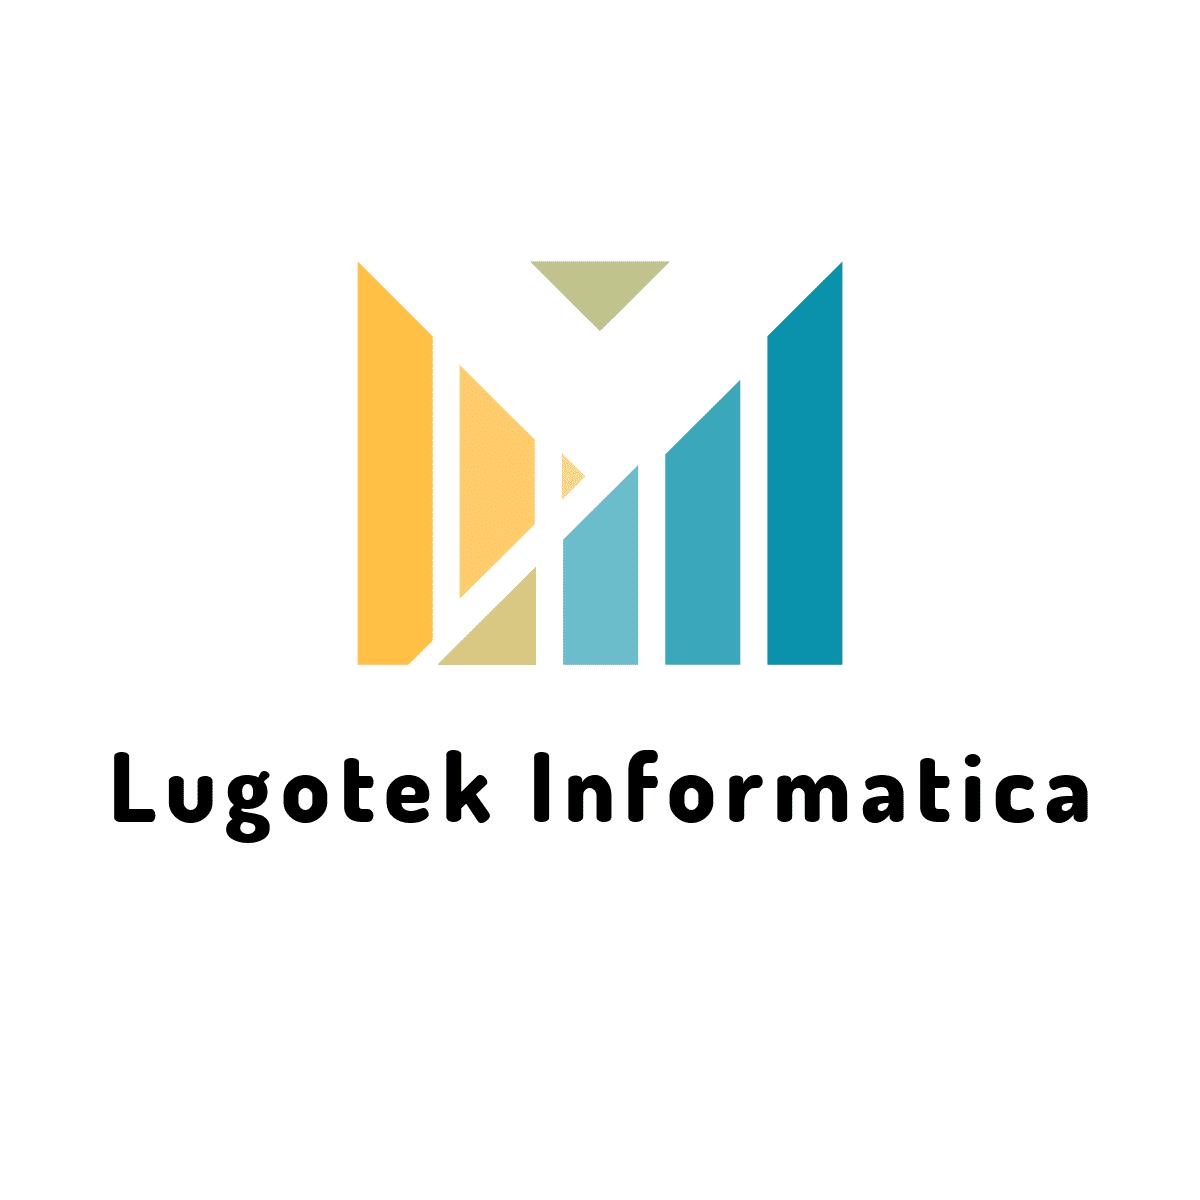 Lugotek Informatica